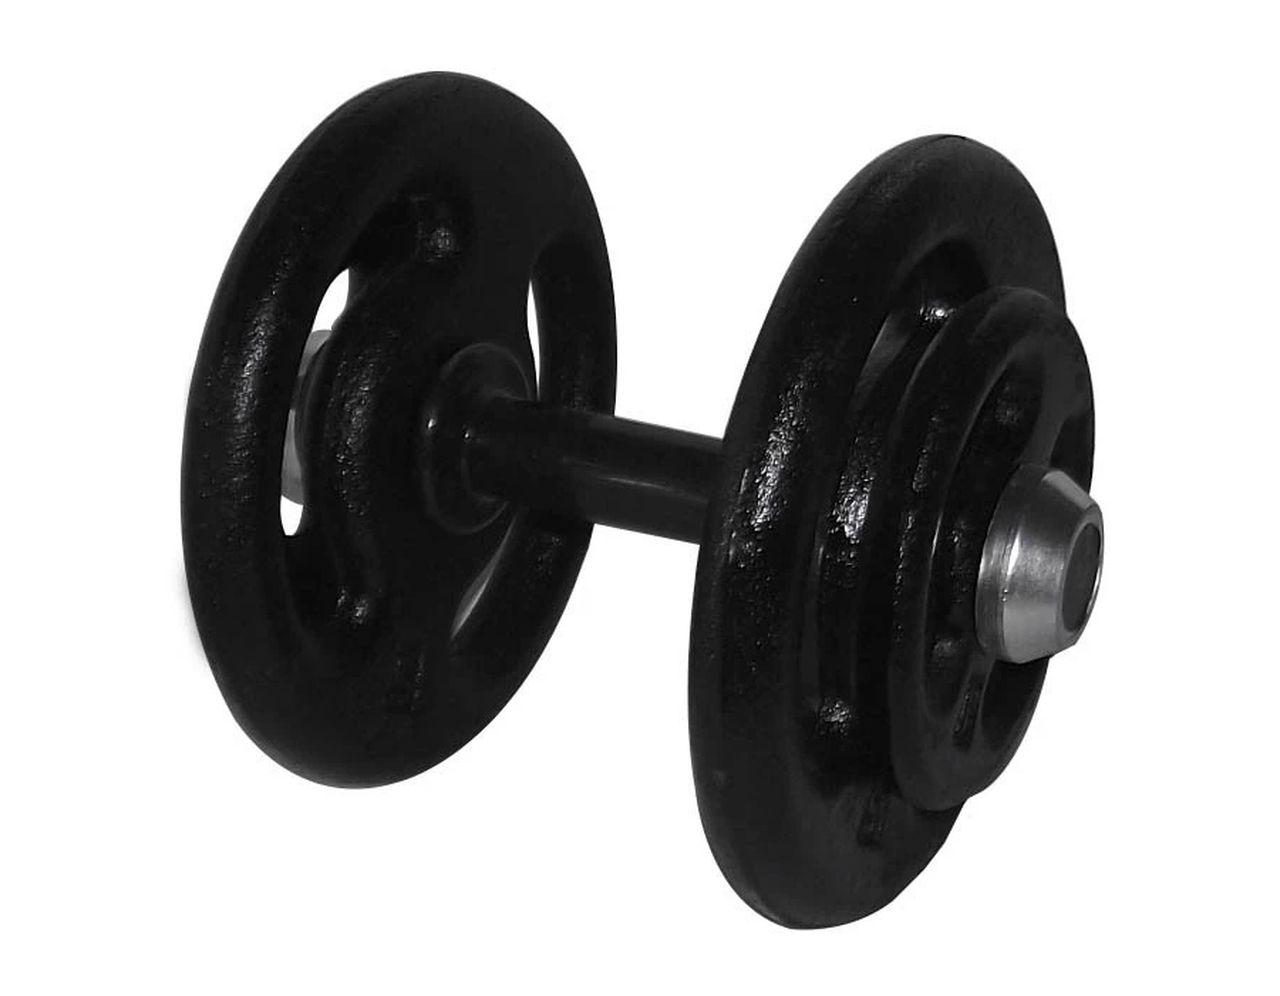 Dumbbell Pintado Pegada Emborrachada Academia Fitness 28kg  - Panela de Ferro Fundido